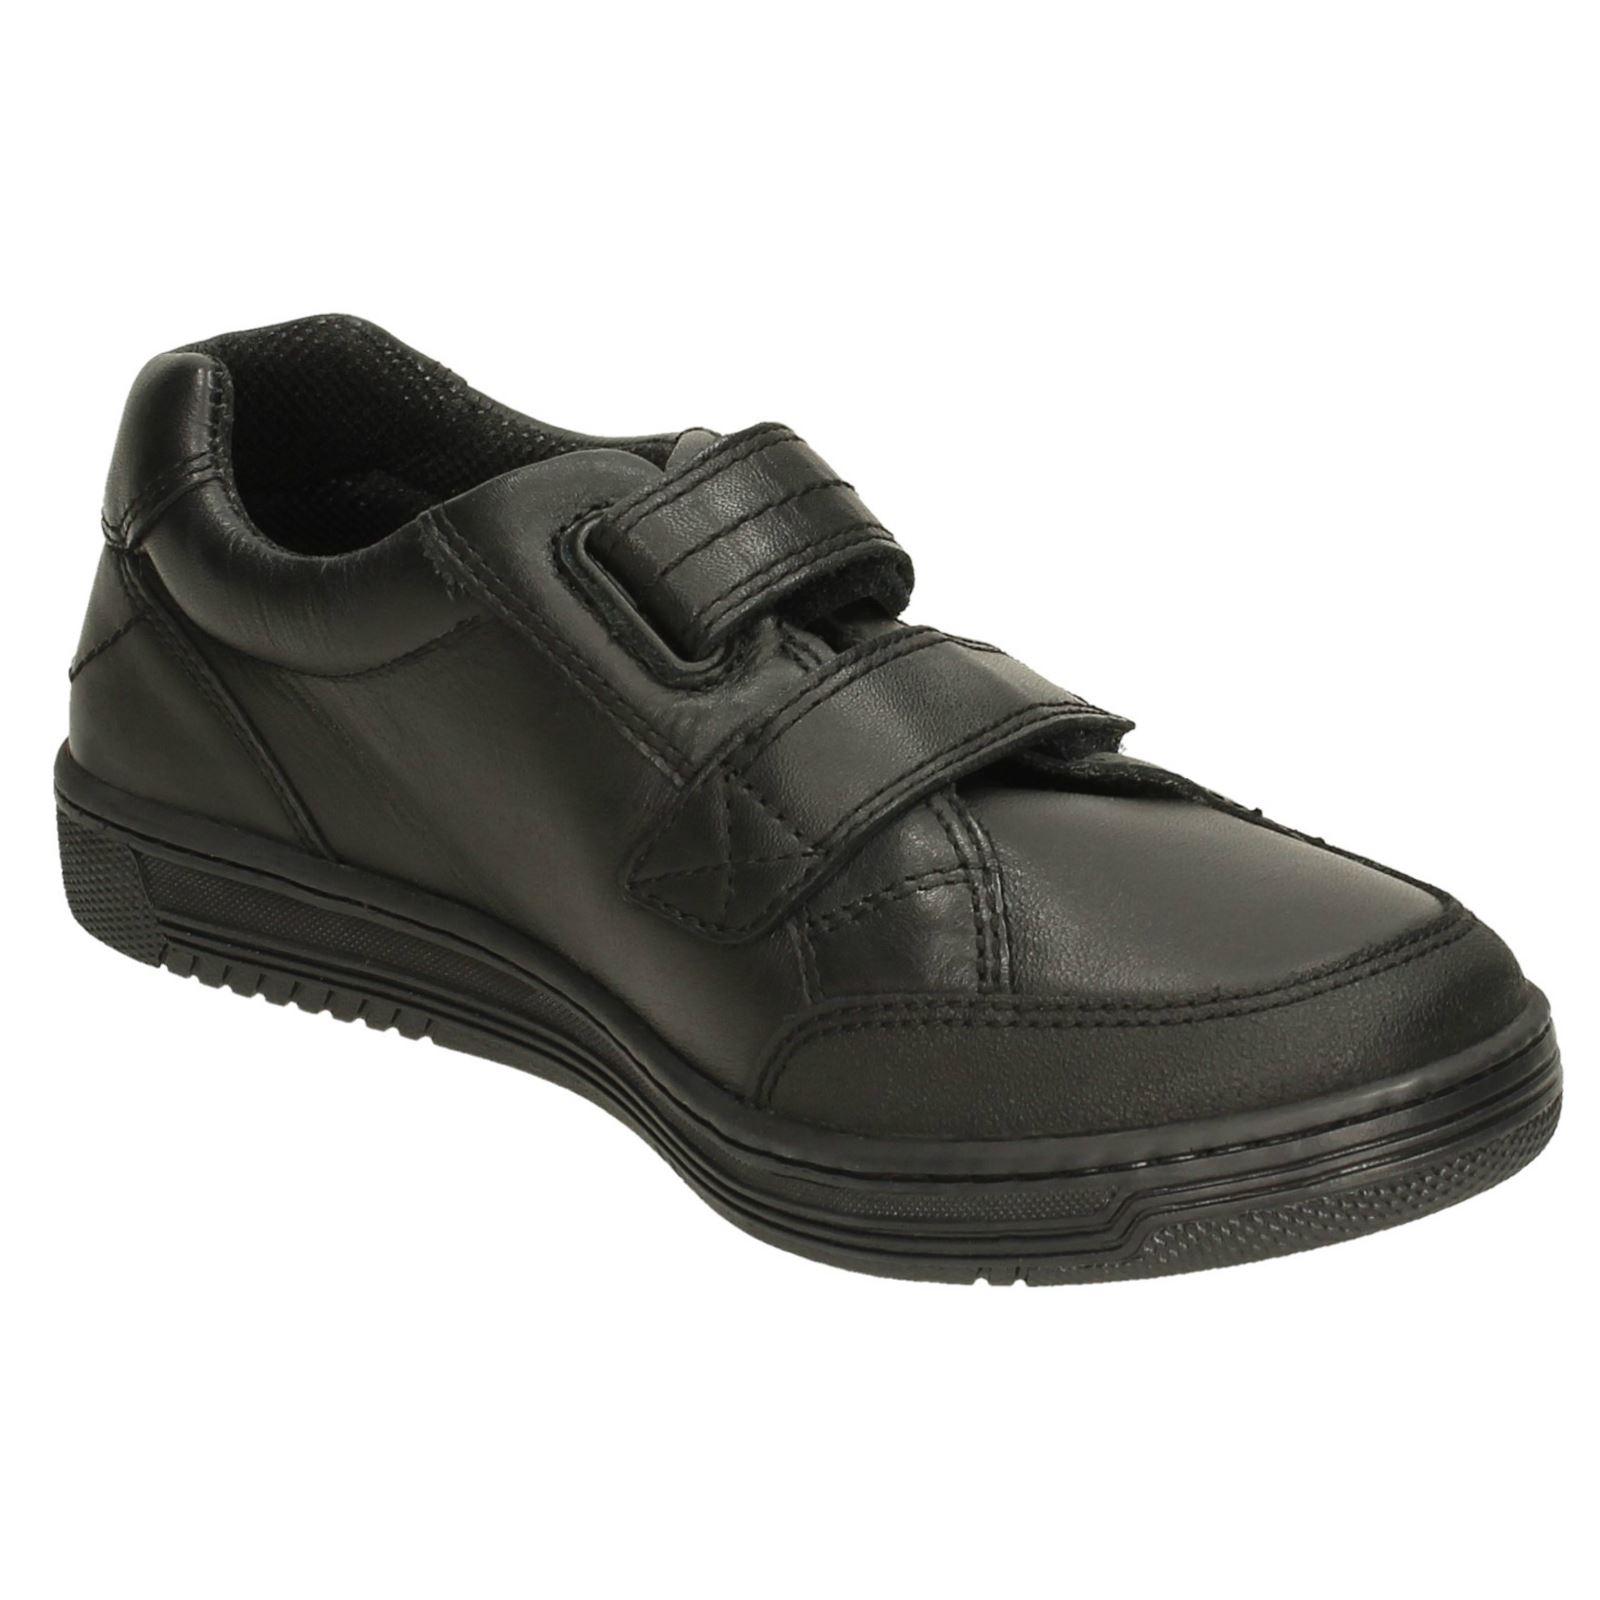 Boys Startrite School Shoes Atom